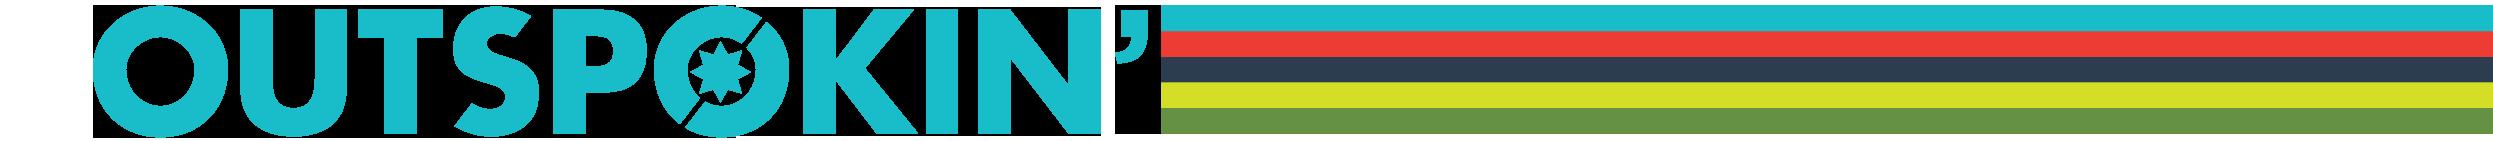 OUTSPOKIN_Rainbow Logo.png